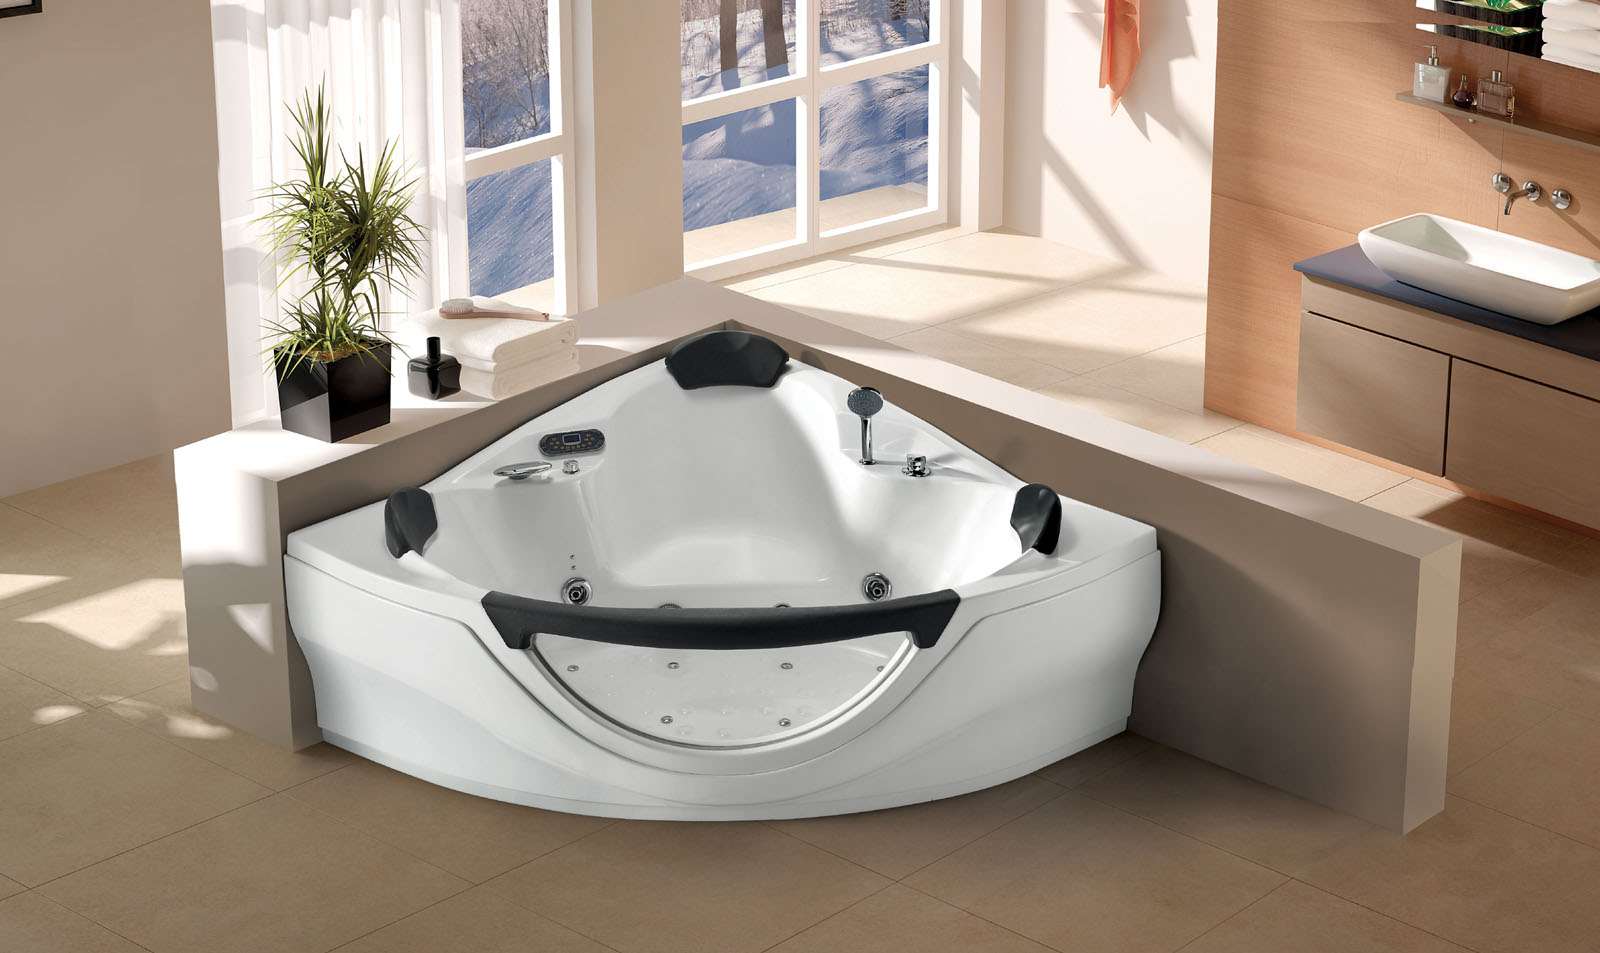 JACUZZI WHIRLPOOL Bathtub wMassage Jets Heated SPA Hot Tub FM MP3 CD Black New  eBay